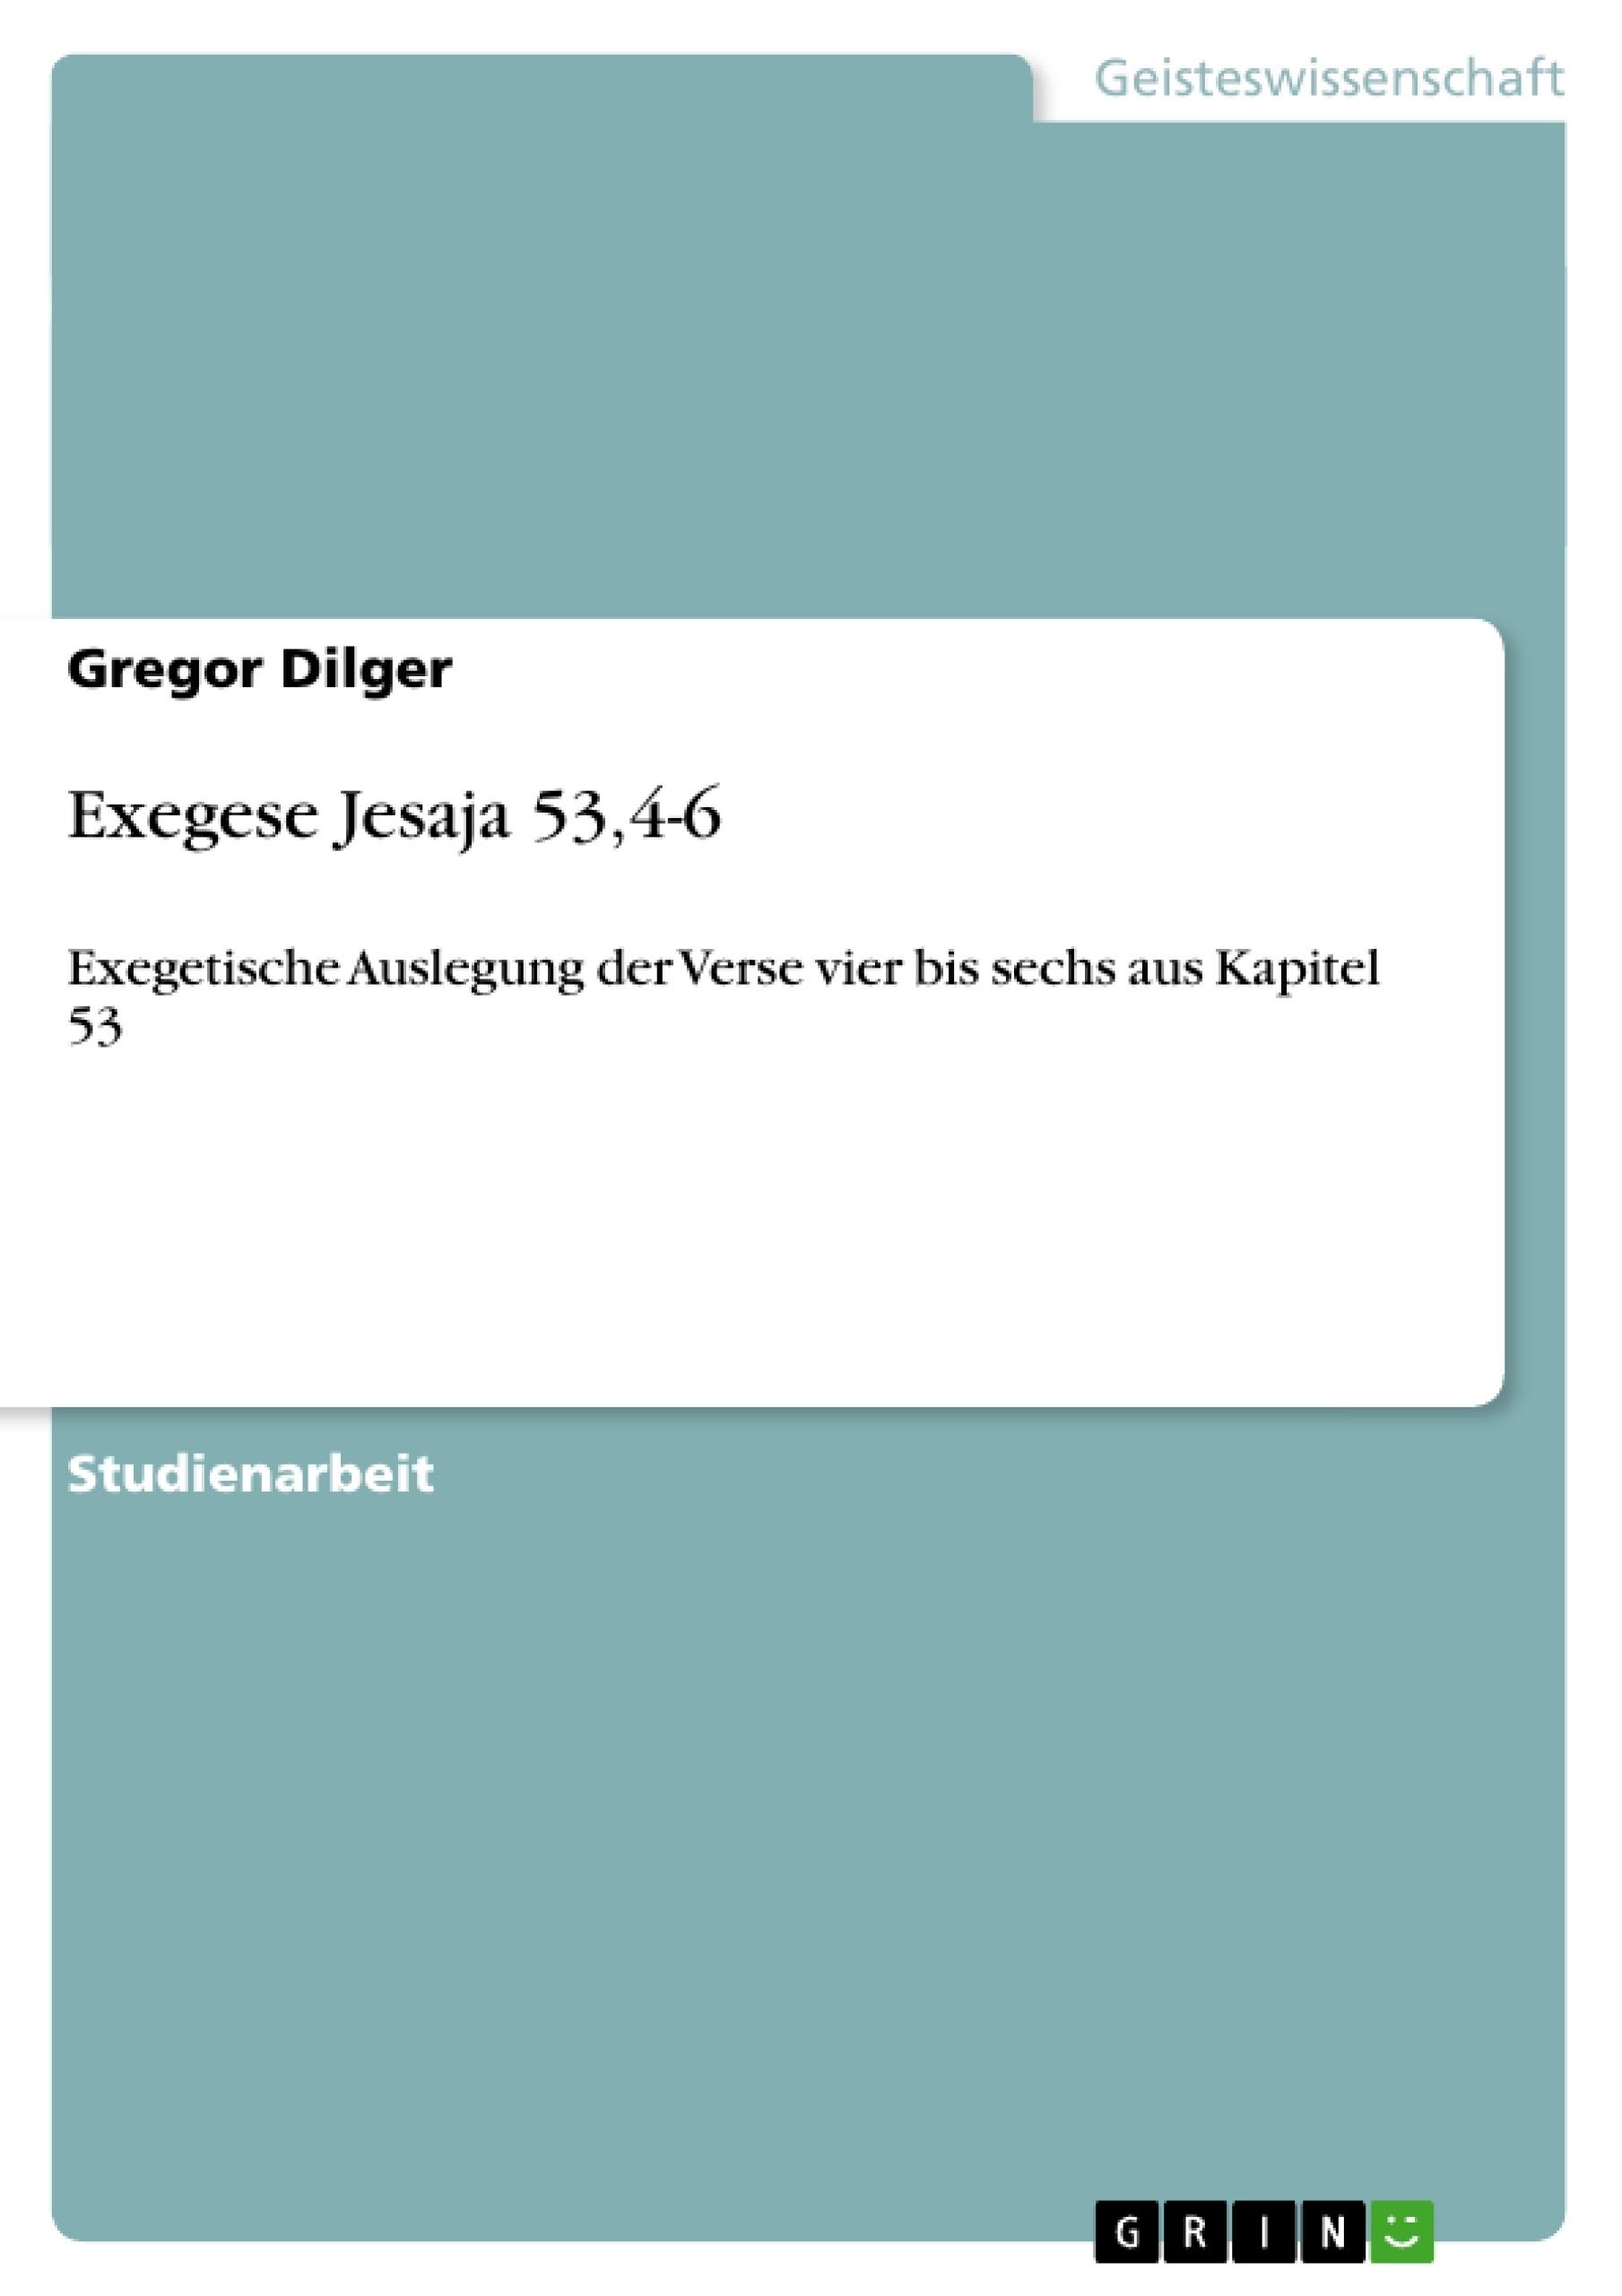 Titel: Exegese Jesaja 53,4-6